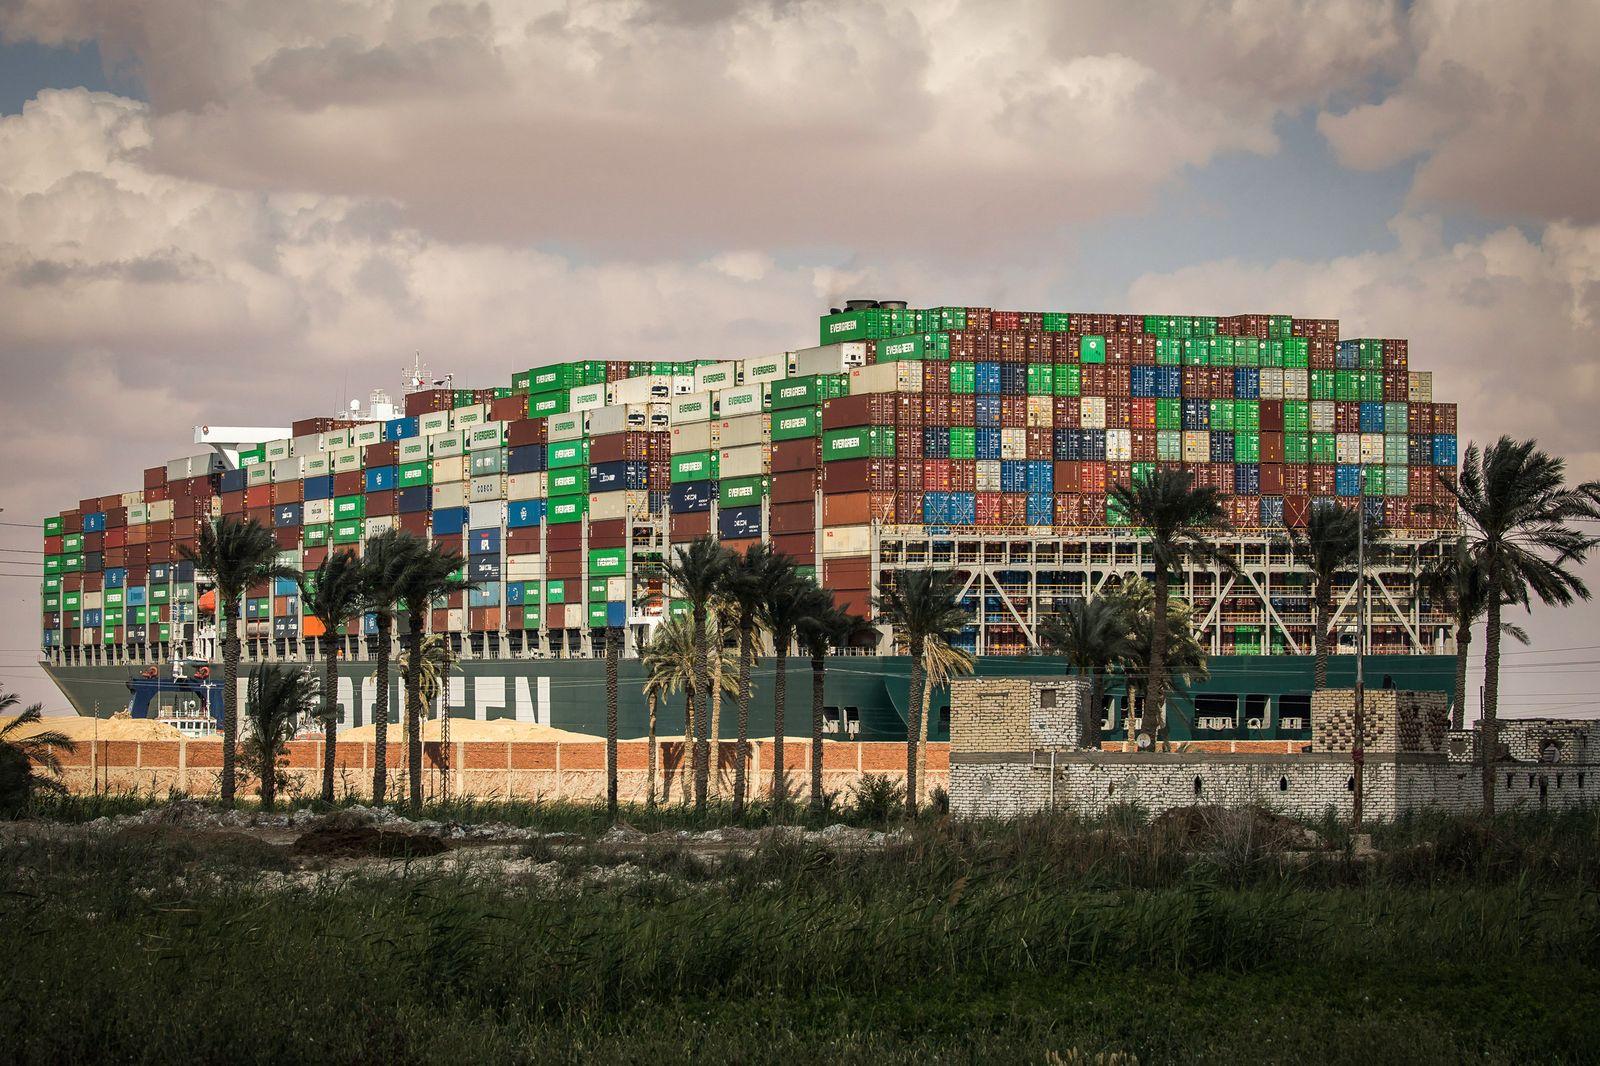 Containerschiff blockiert Suezkanal